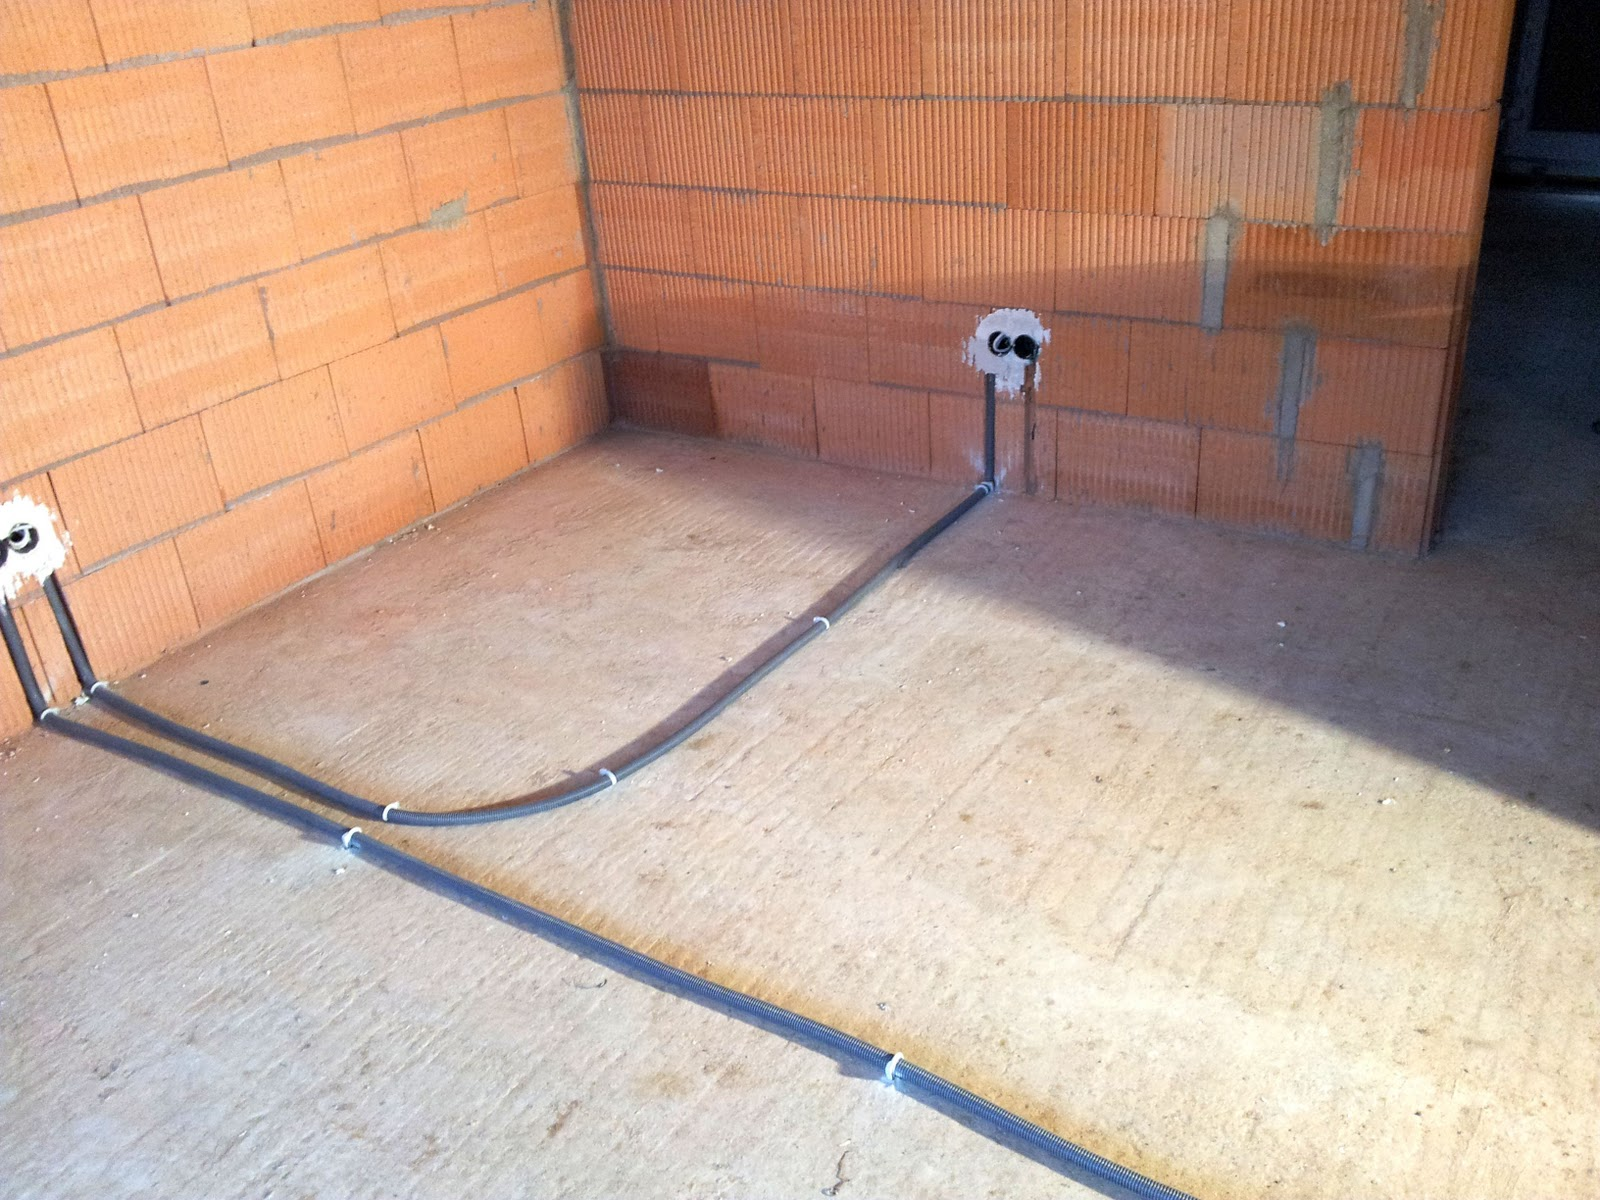 sat kabel verlegen cmtronic koaxial anschluss kabel sat. Black Bedroom Furniture Sets. Home Design Ideas